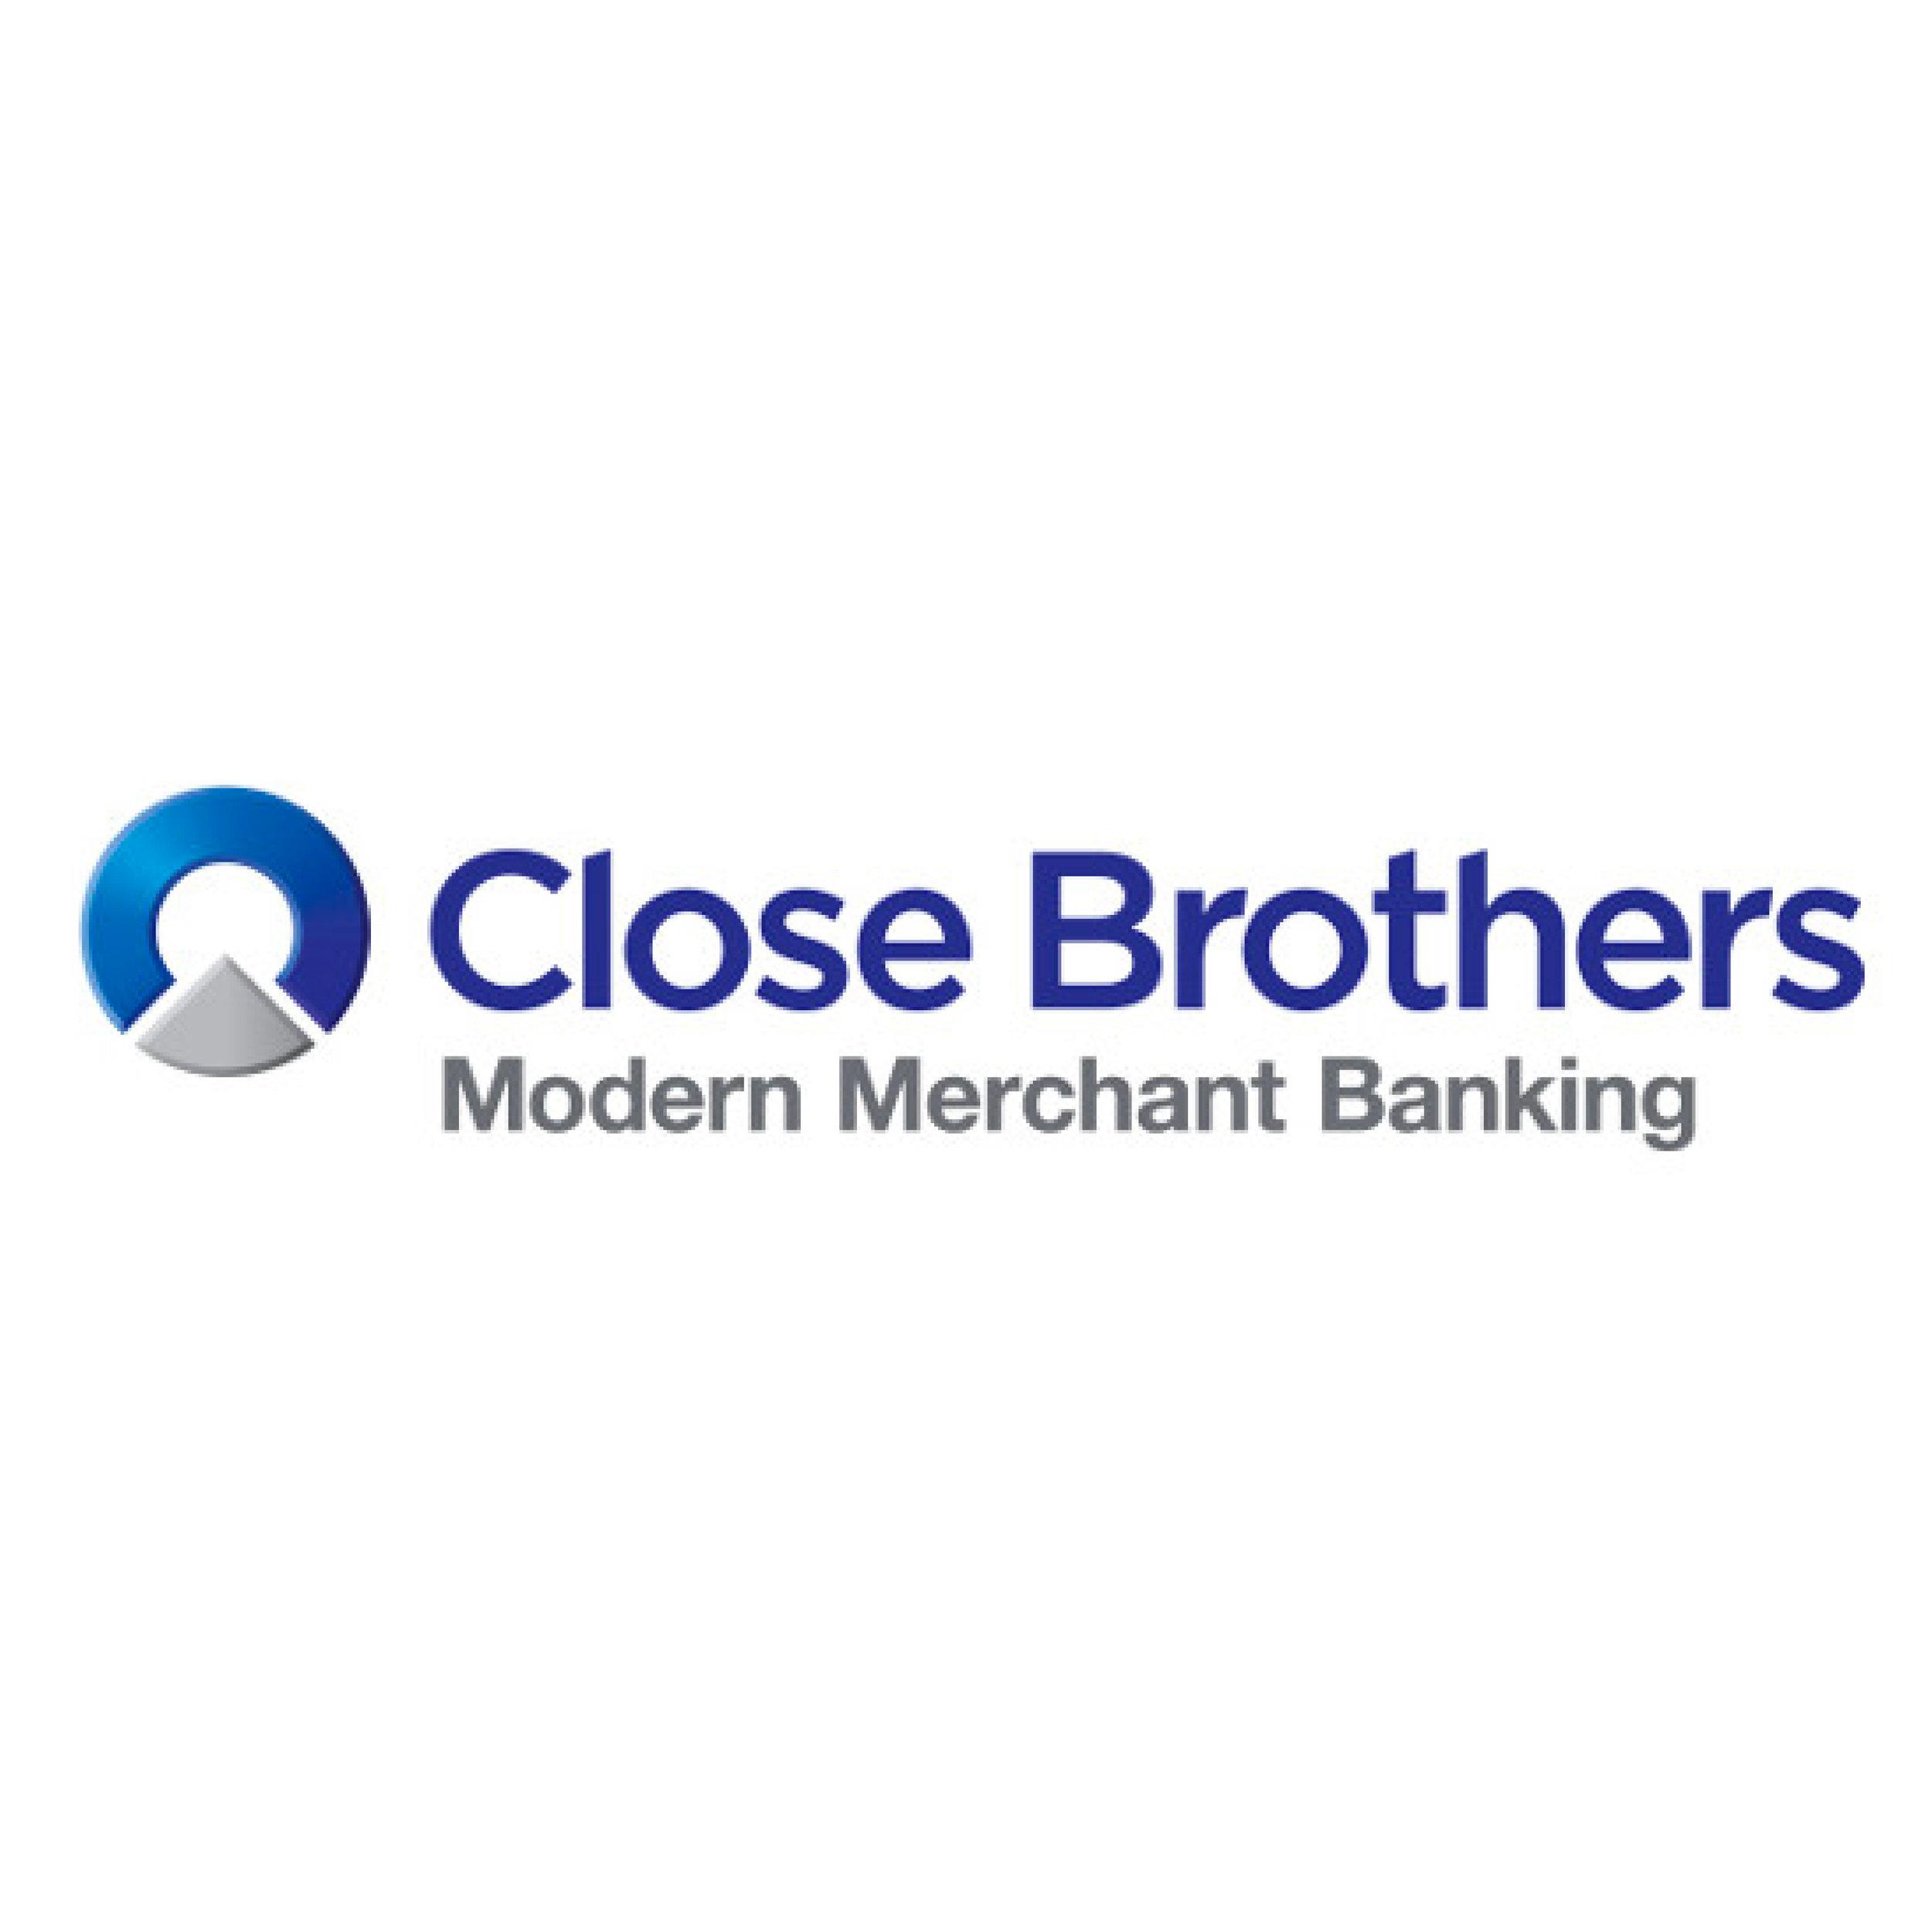 Close_Brothers-01.jpg